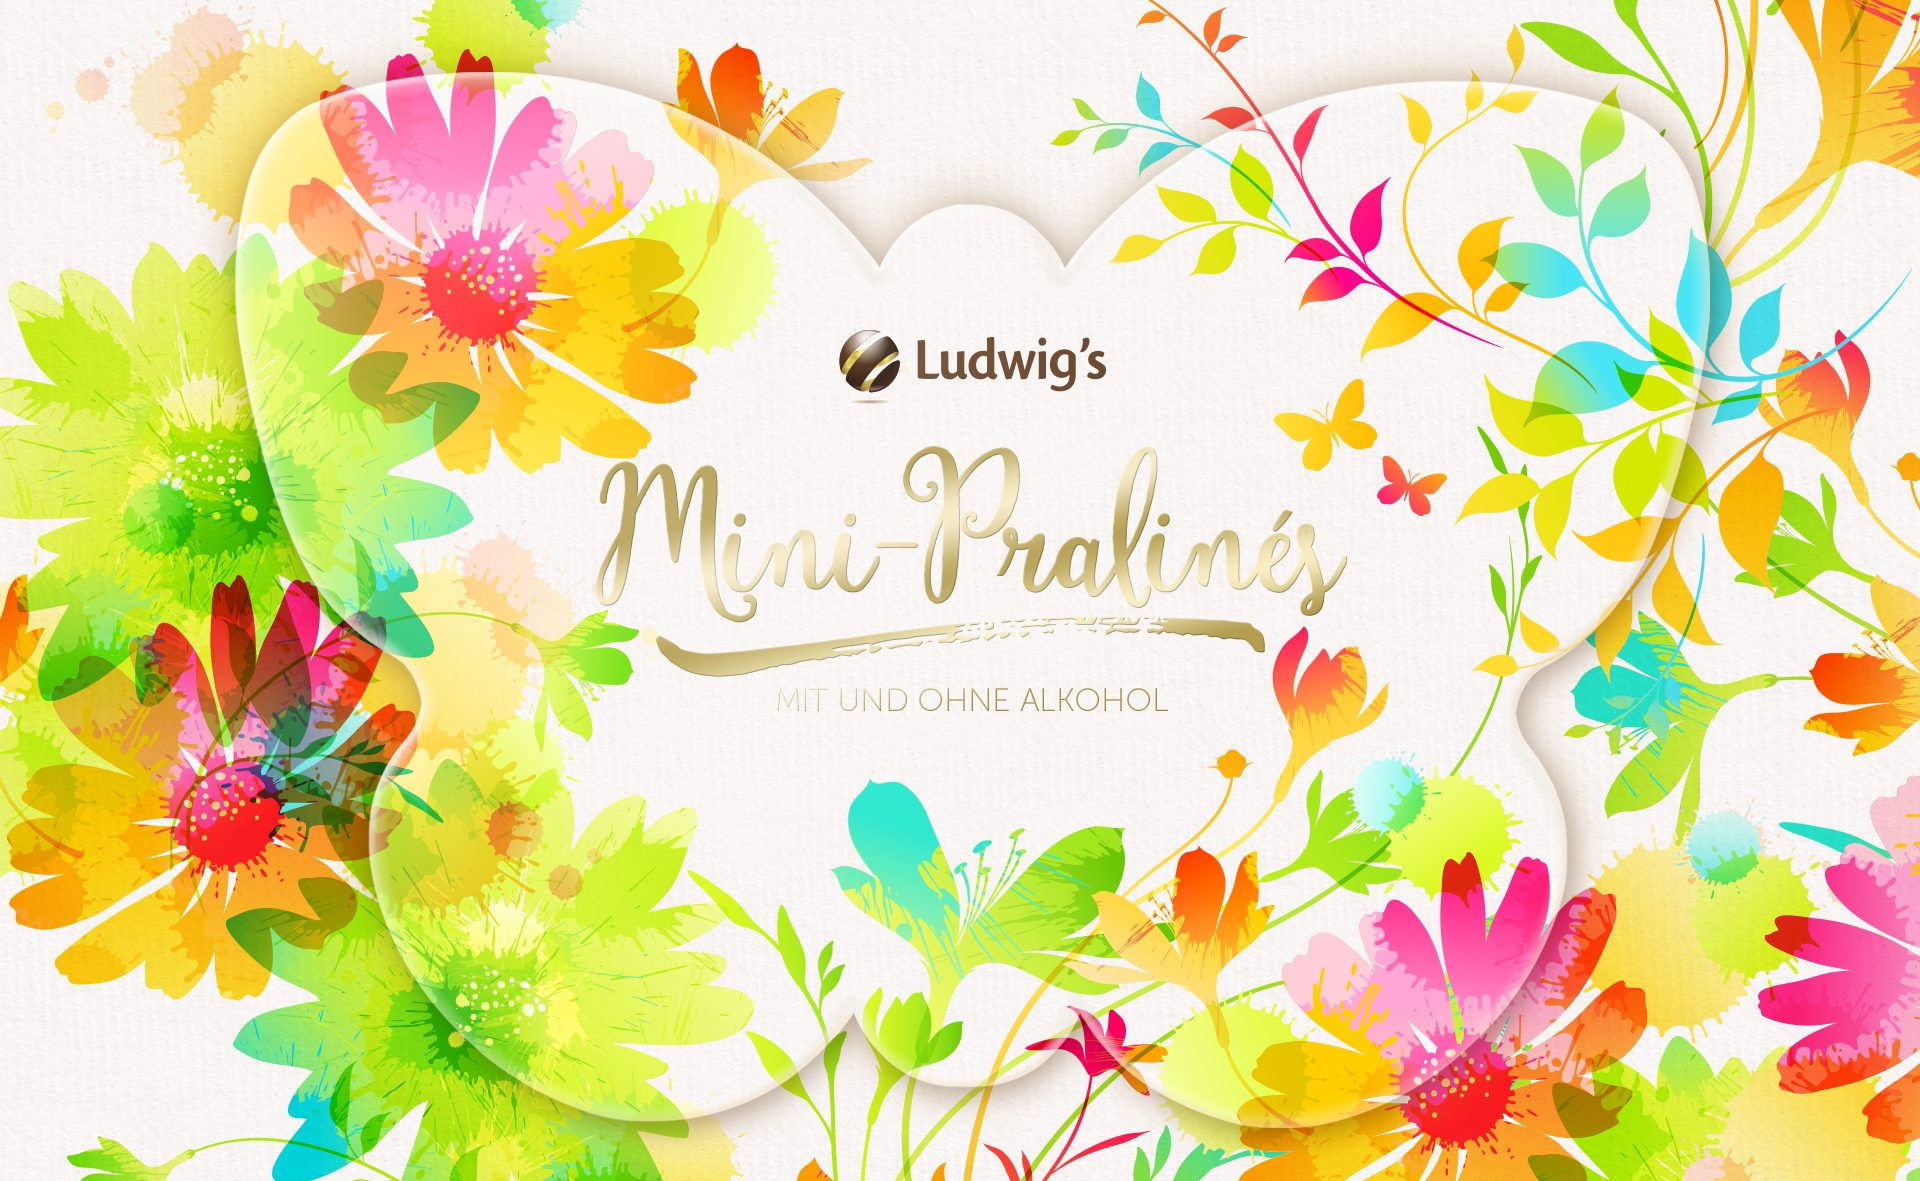 Verpackungsdesign Malvega - Referenz: Mini Pralinen Ostern, Ludwig's